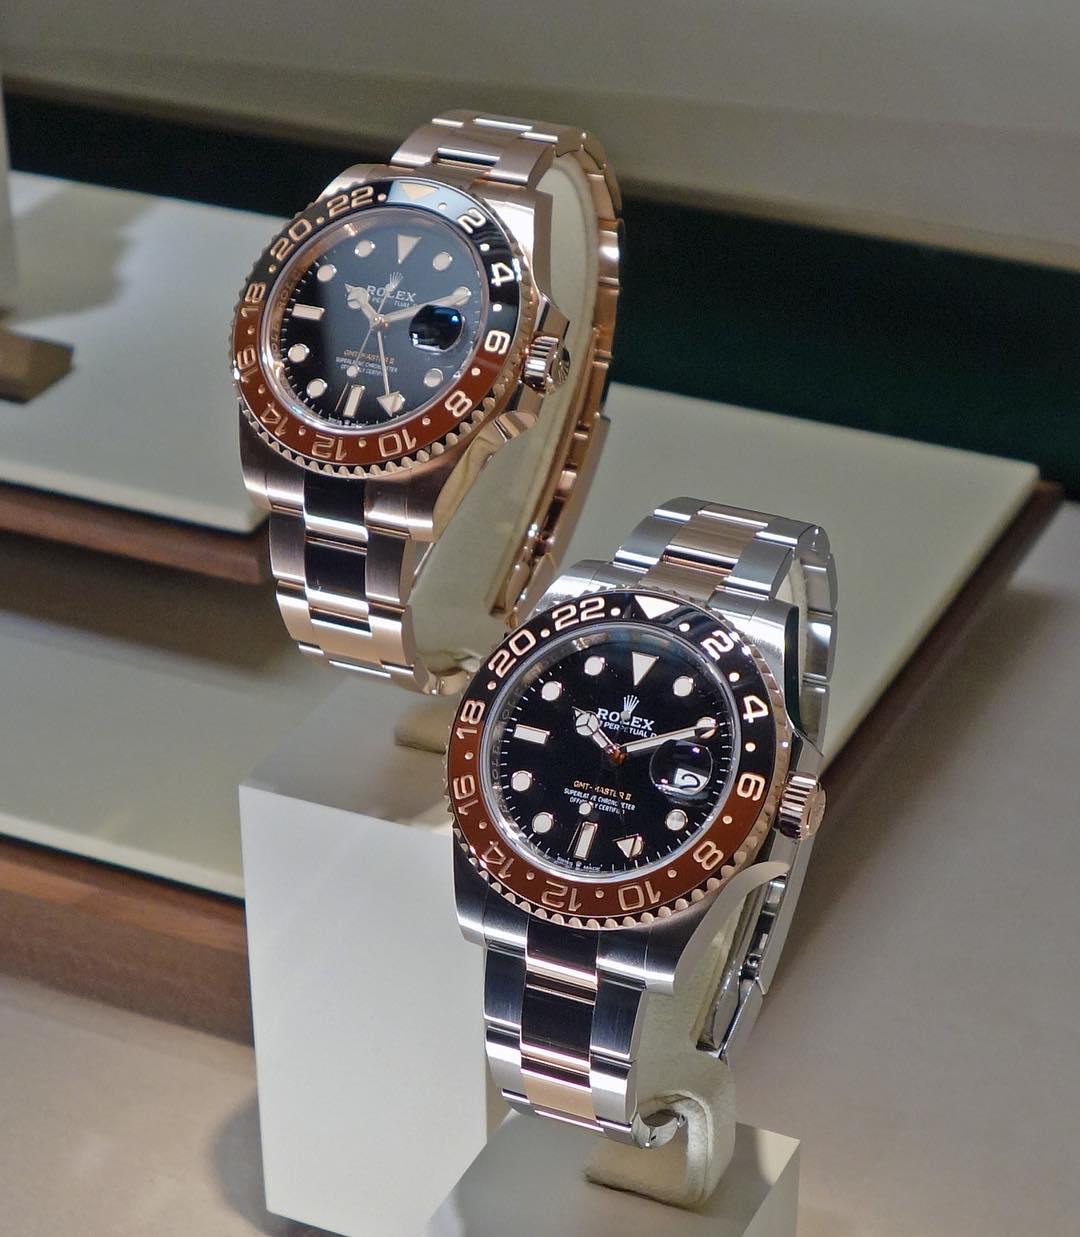 Rolex GMT-Master II Ref. 126715CHNR & 126711CHNR